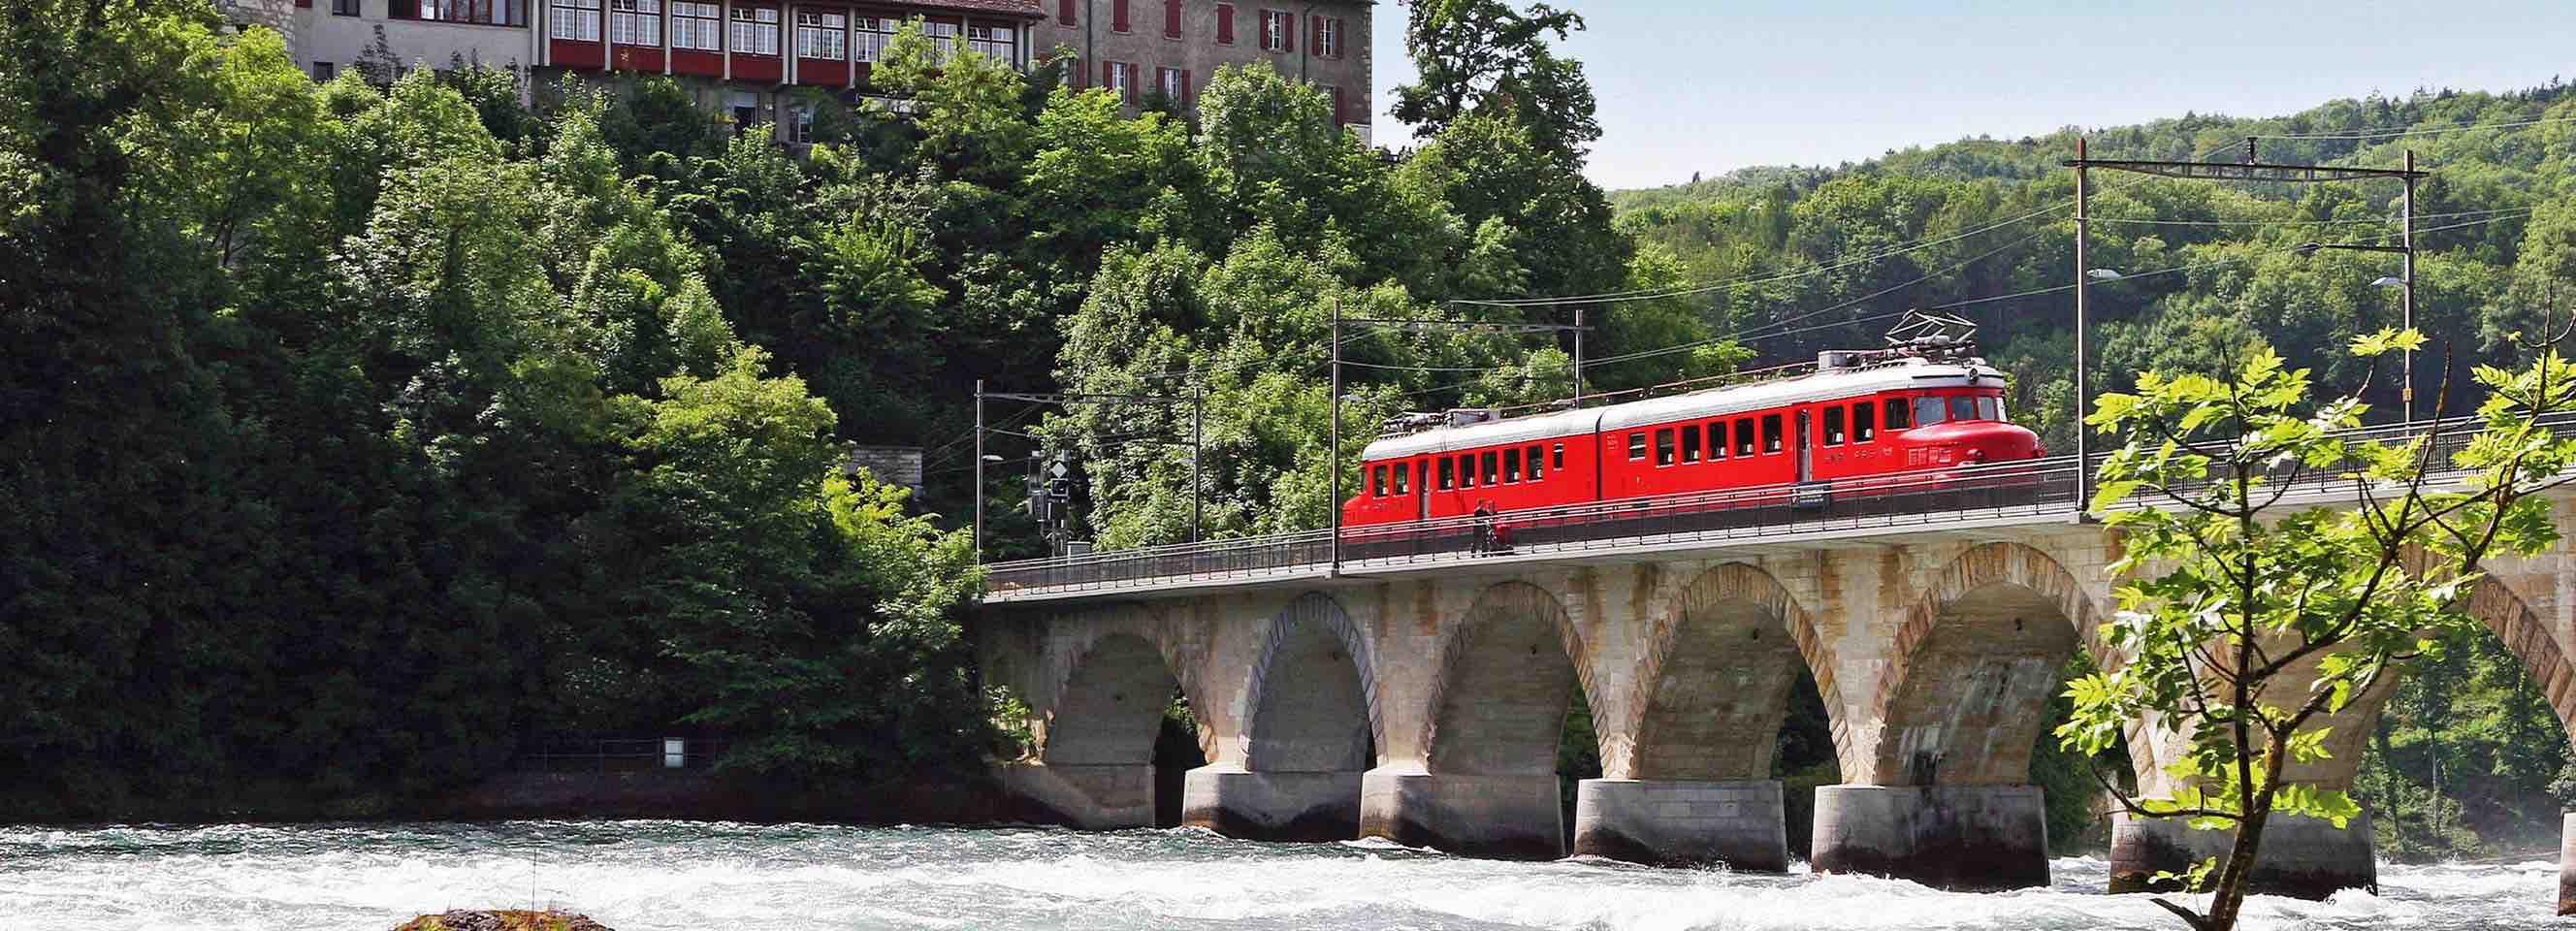 Brunch on Churchil red arrow train